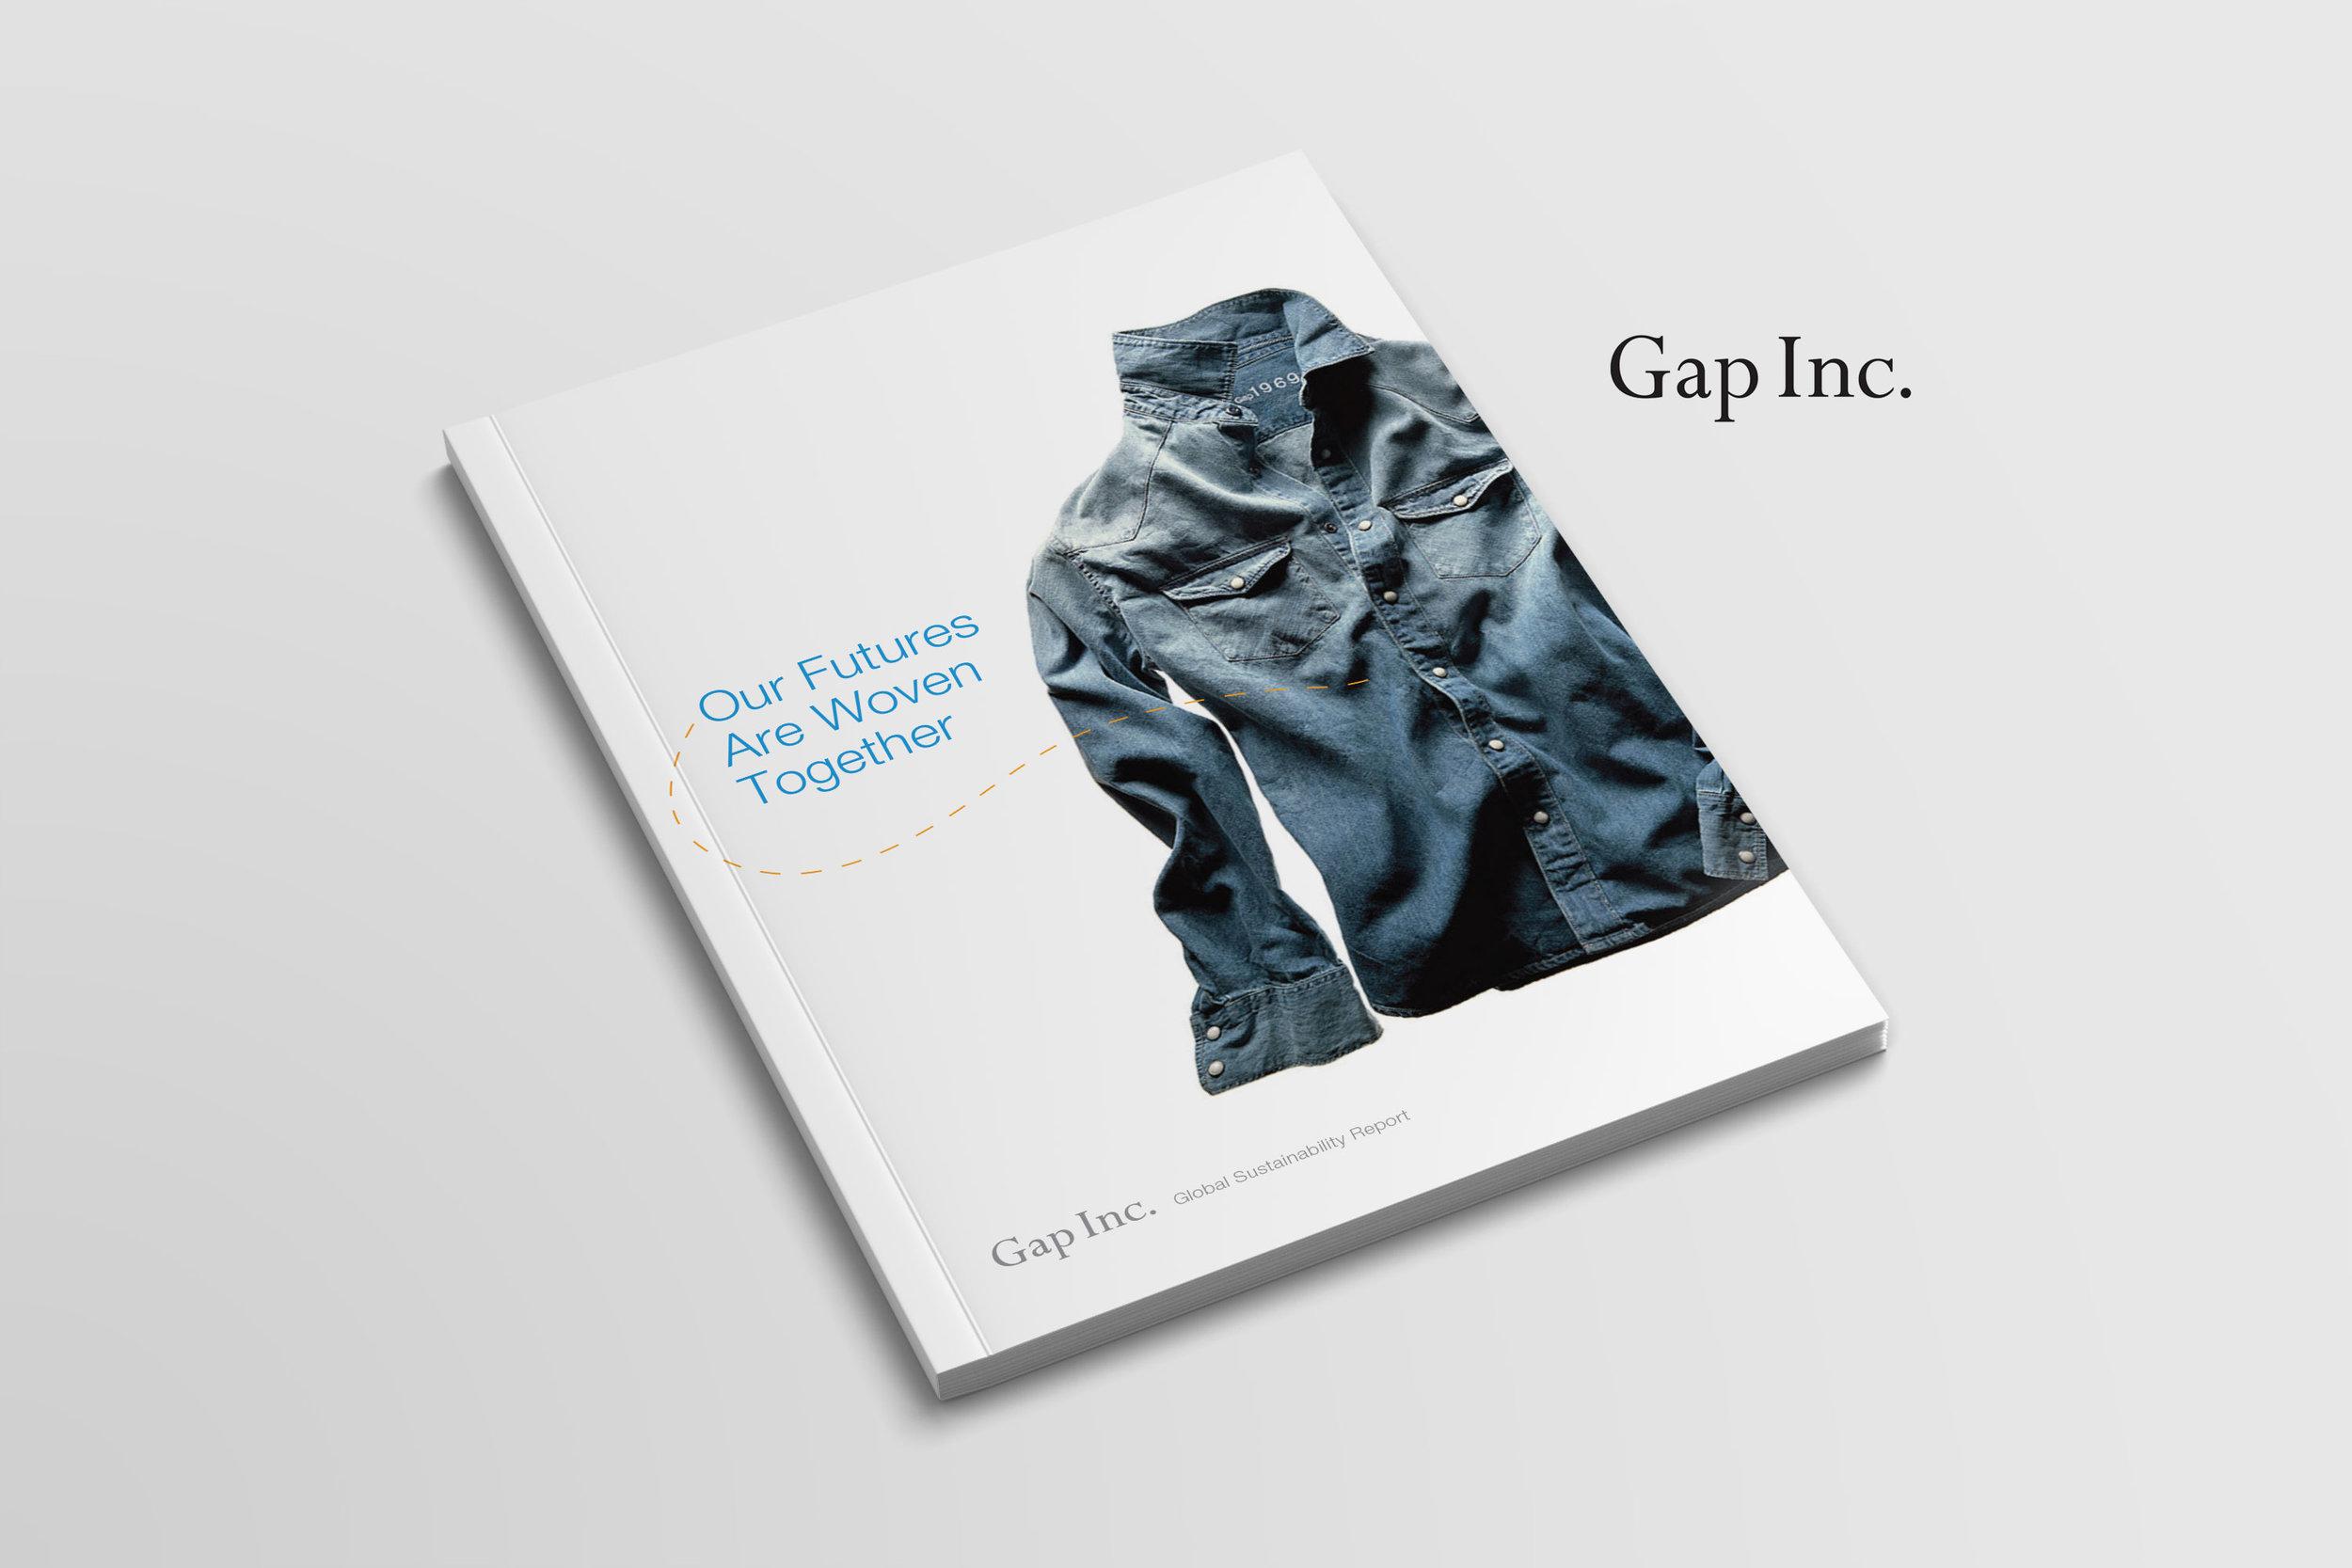 gapinc1.jpg